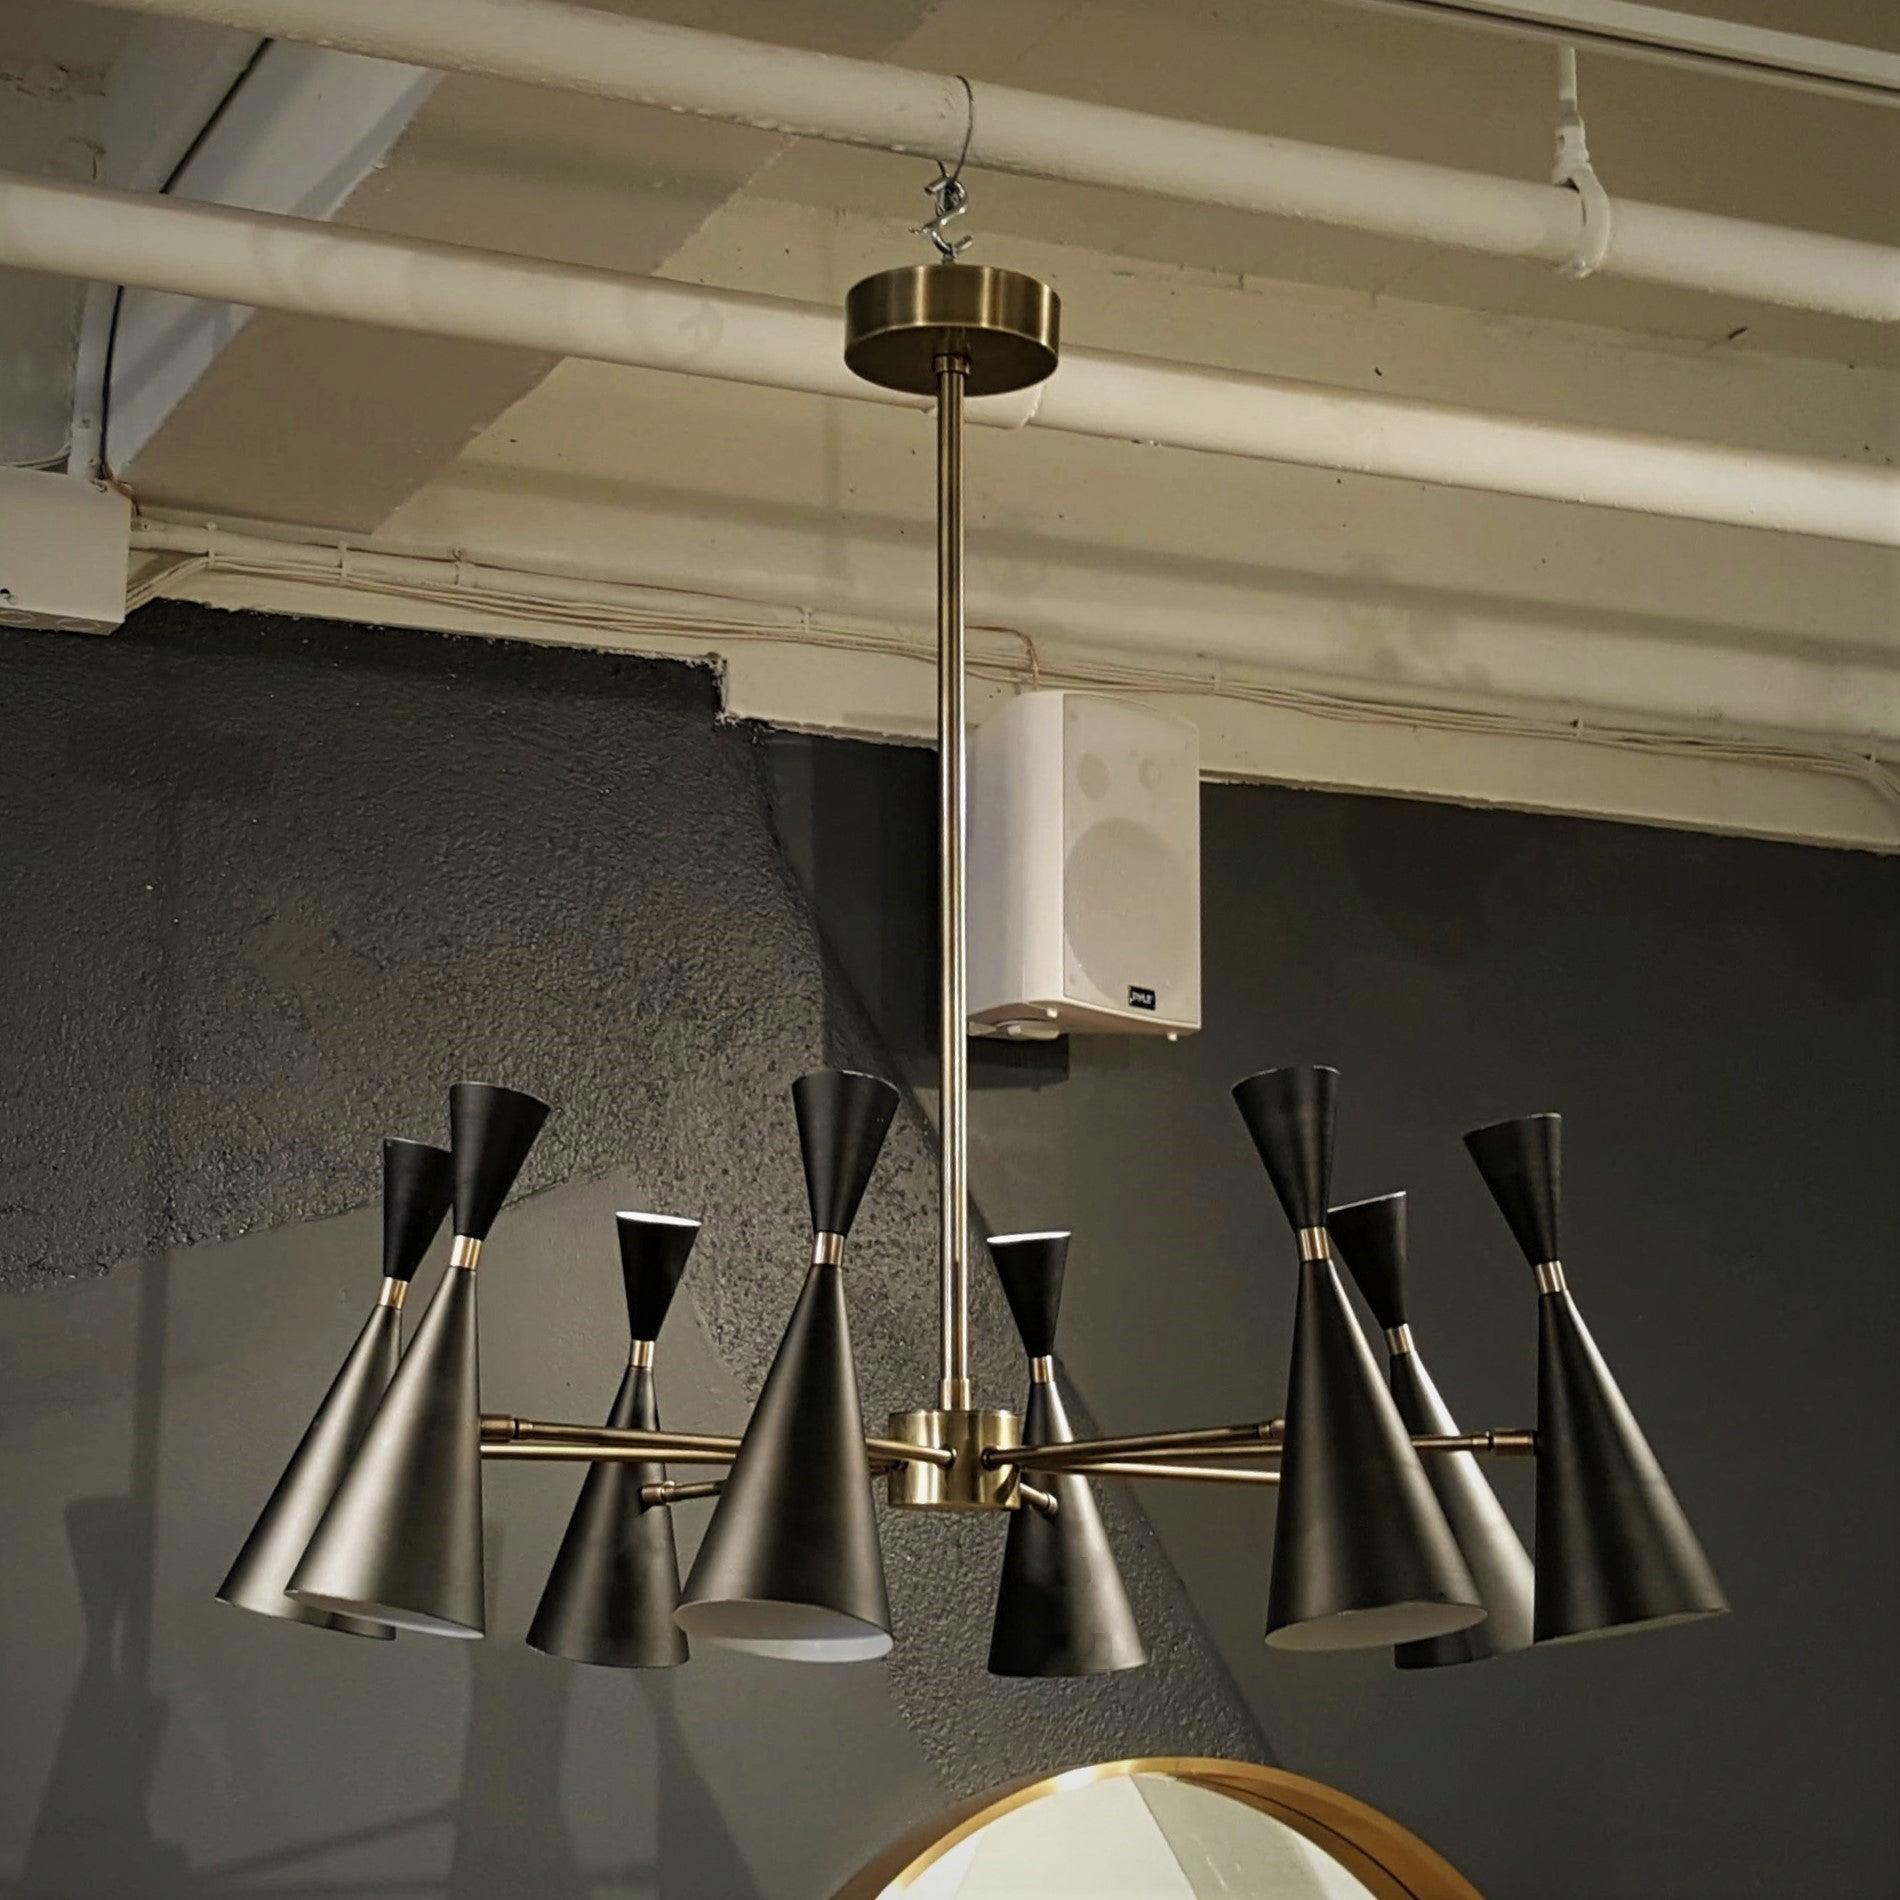 Petite Monolith Italian Modern Brass Chandelier By Blueprint Lighting, 2017